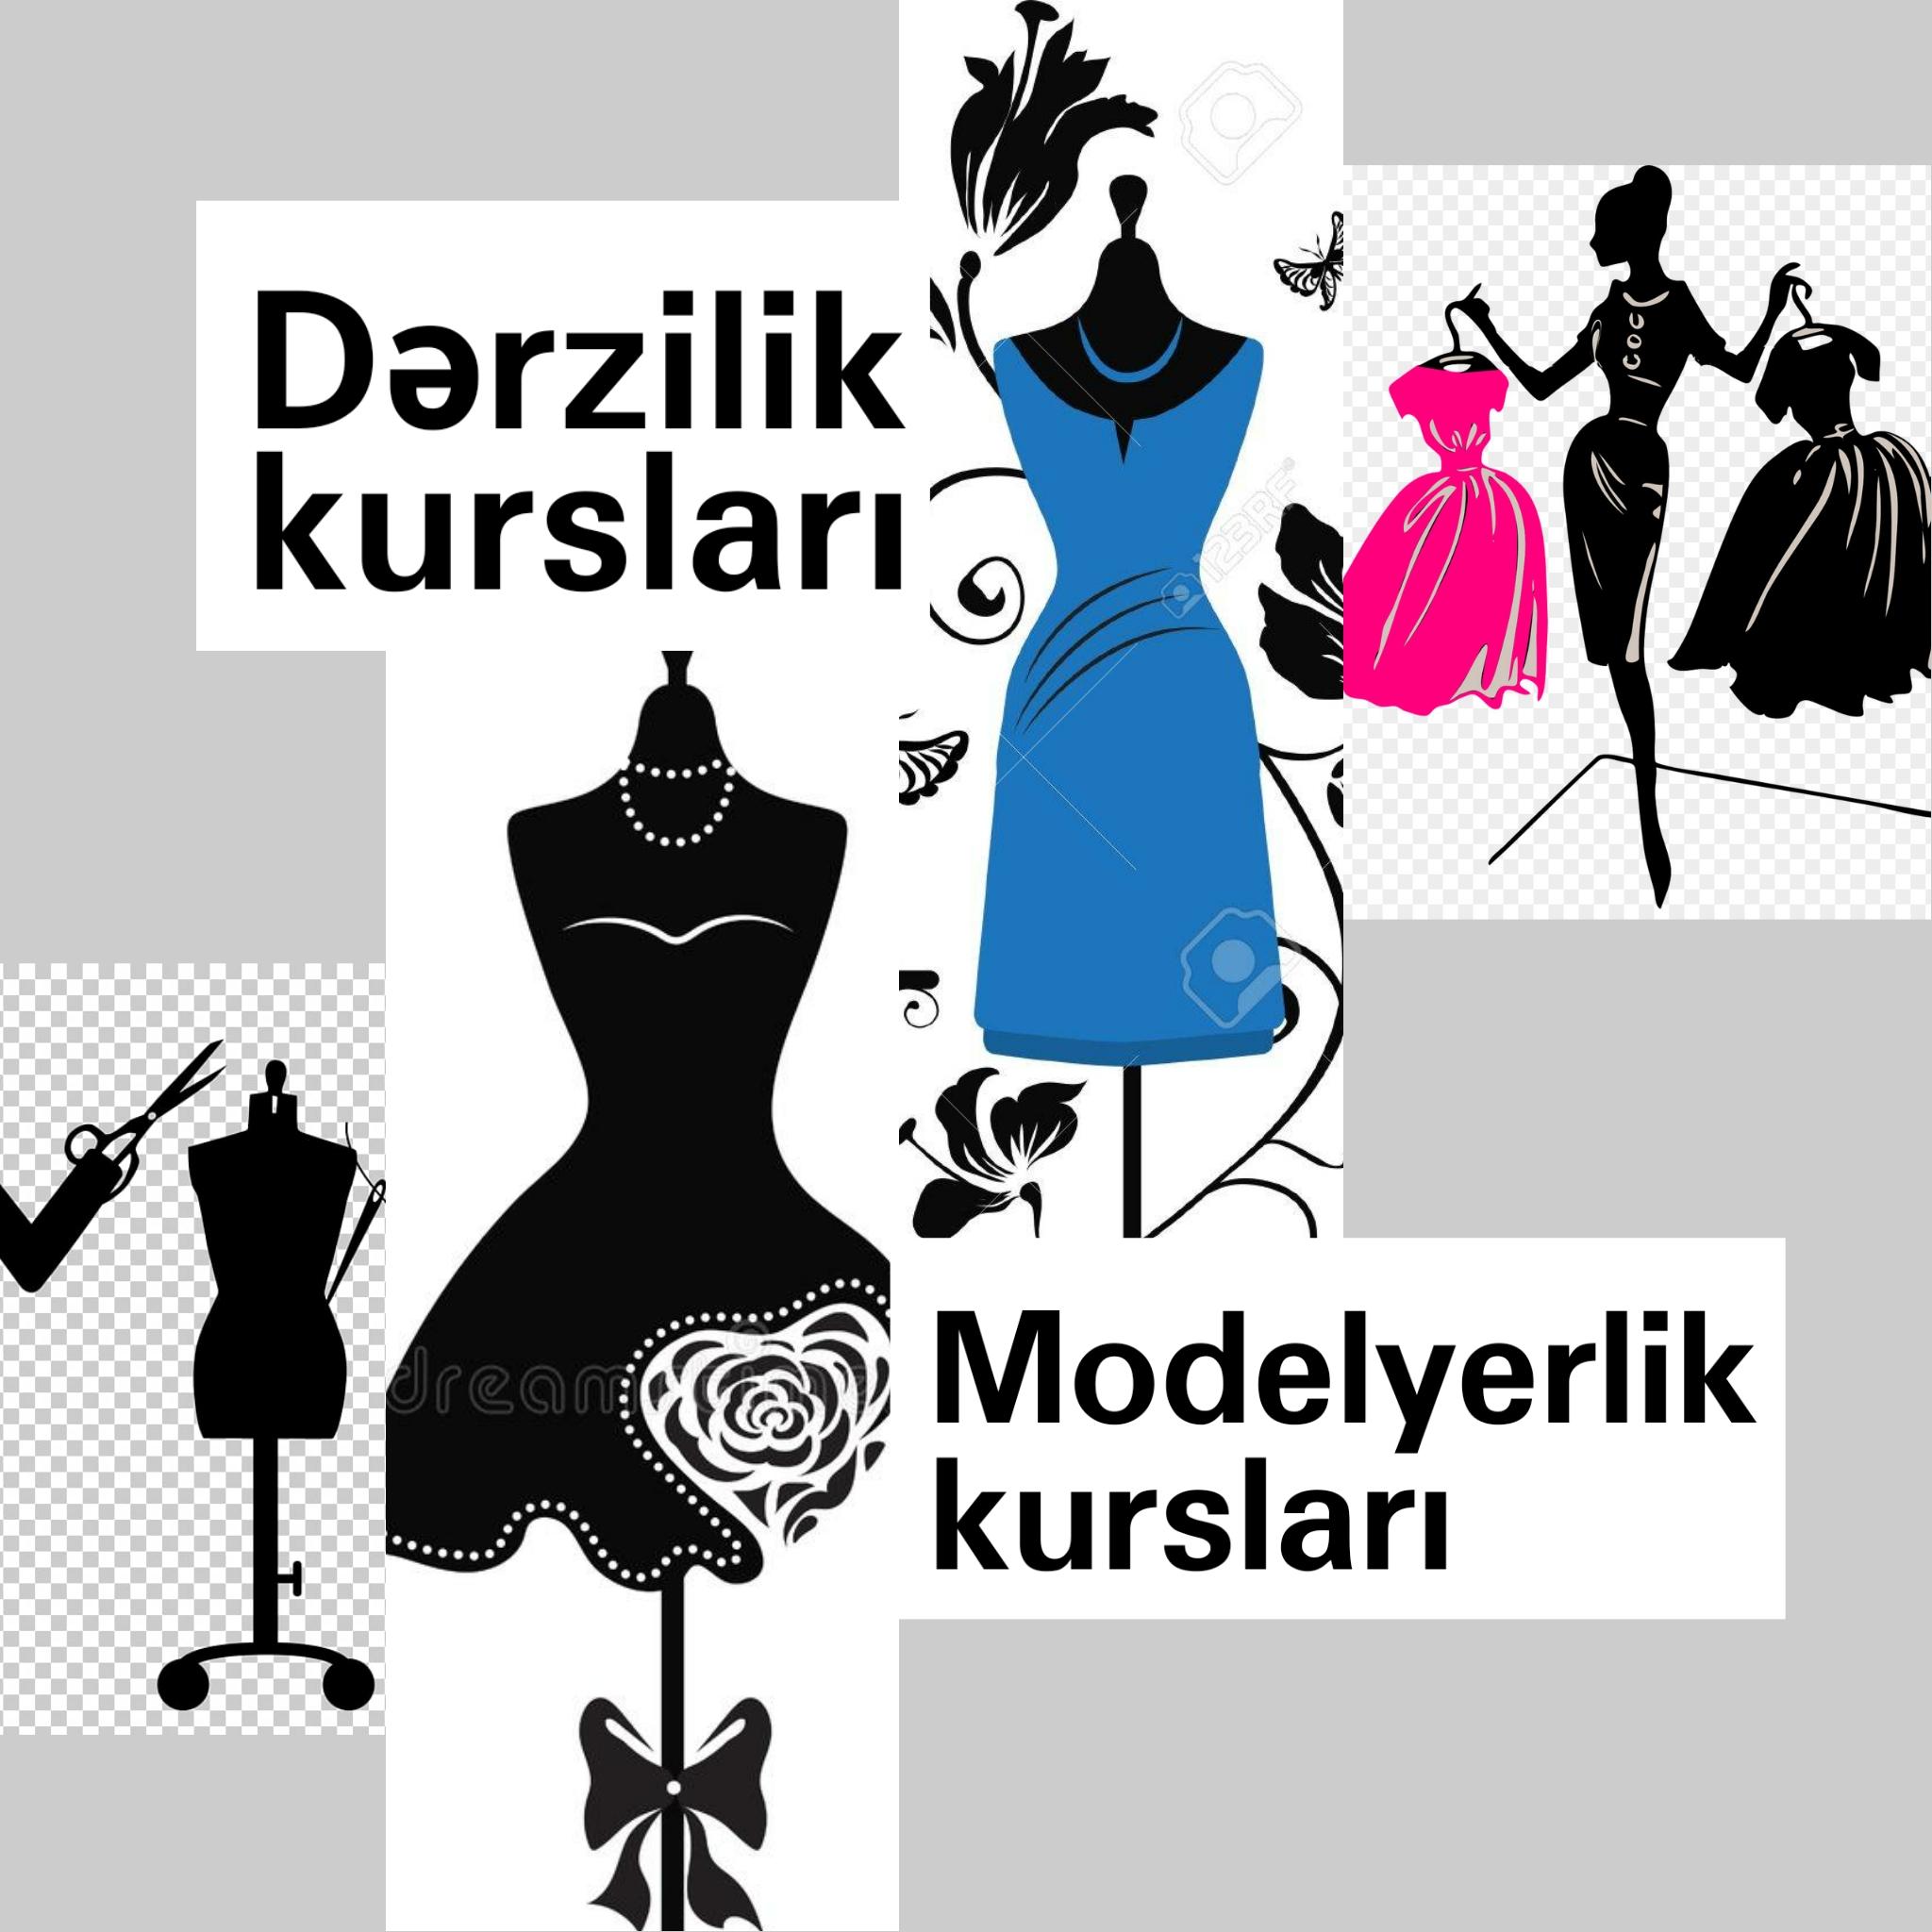 Dərzilik, Modelyerlik kursları: Dərzilik kursuna daxildi;